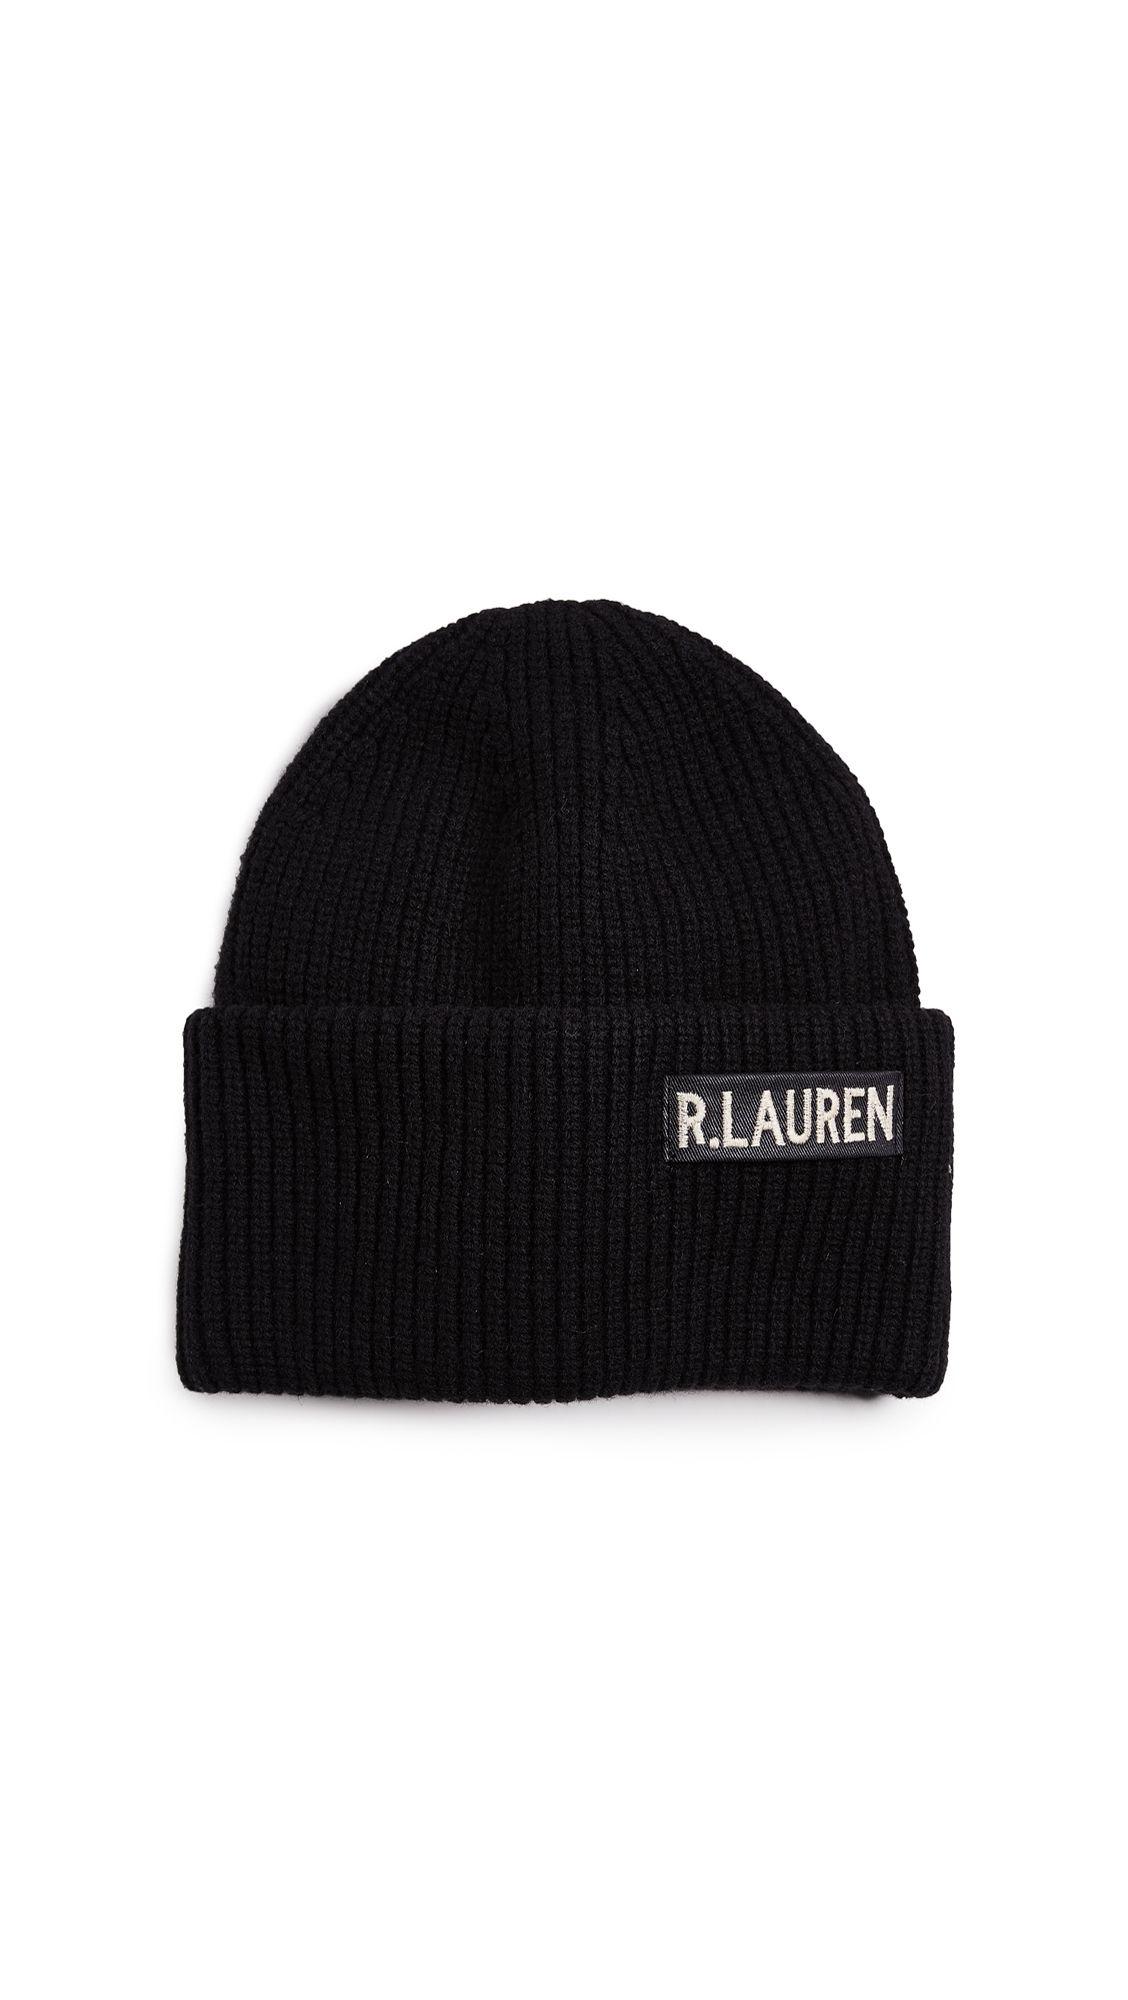 d5cc815e POLO RALPH LAUREN SURPLUS CUFF HAT. #poloralphlauren   Polo Ralph ...